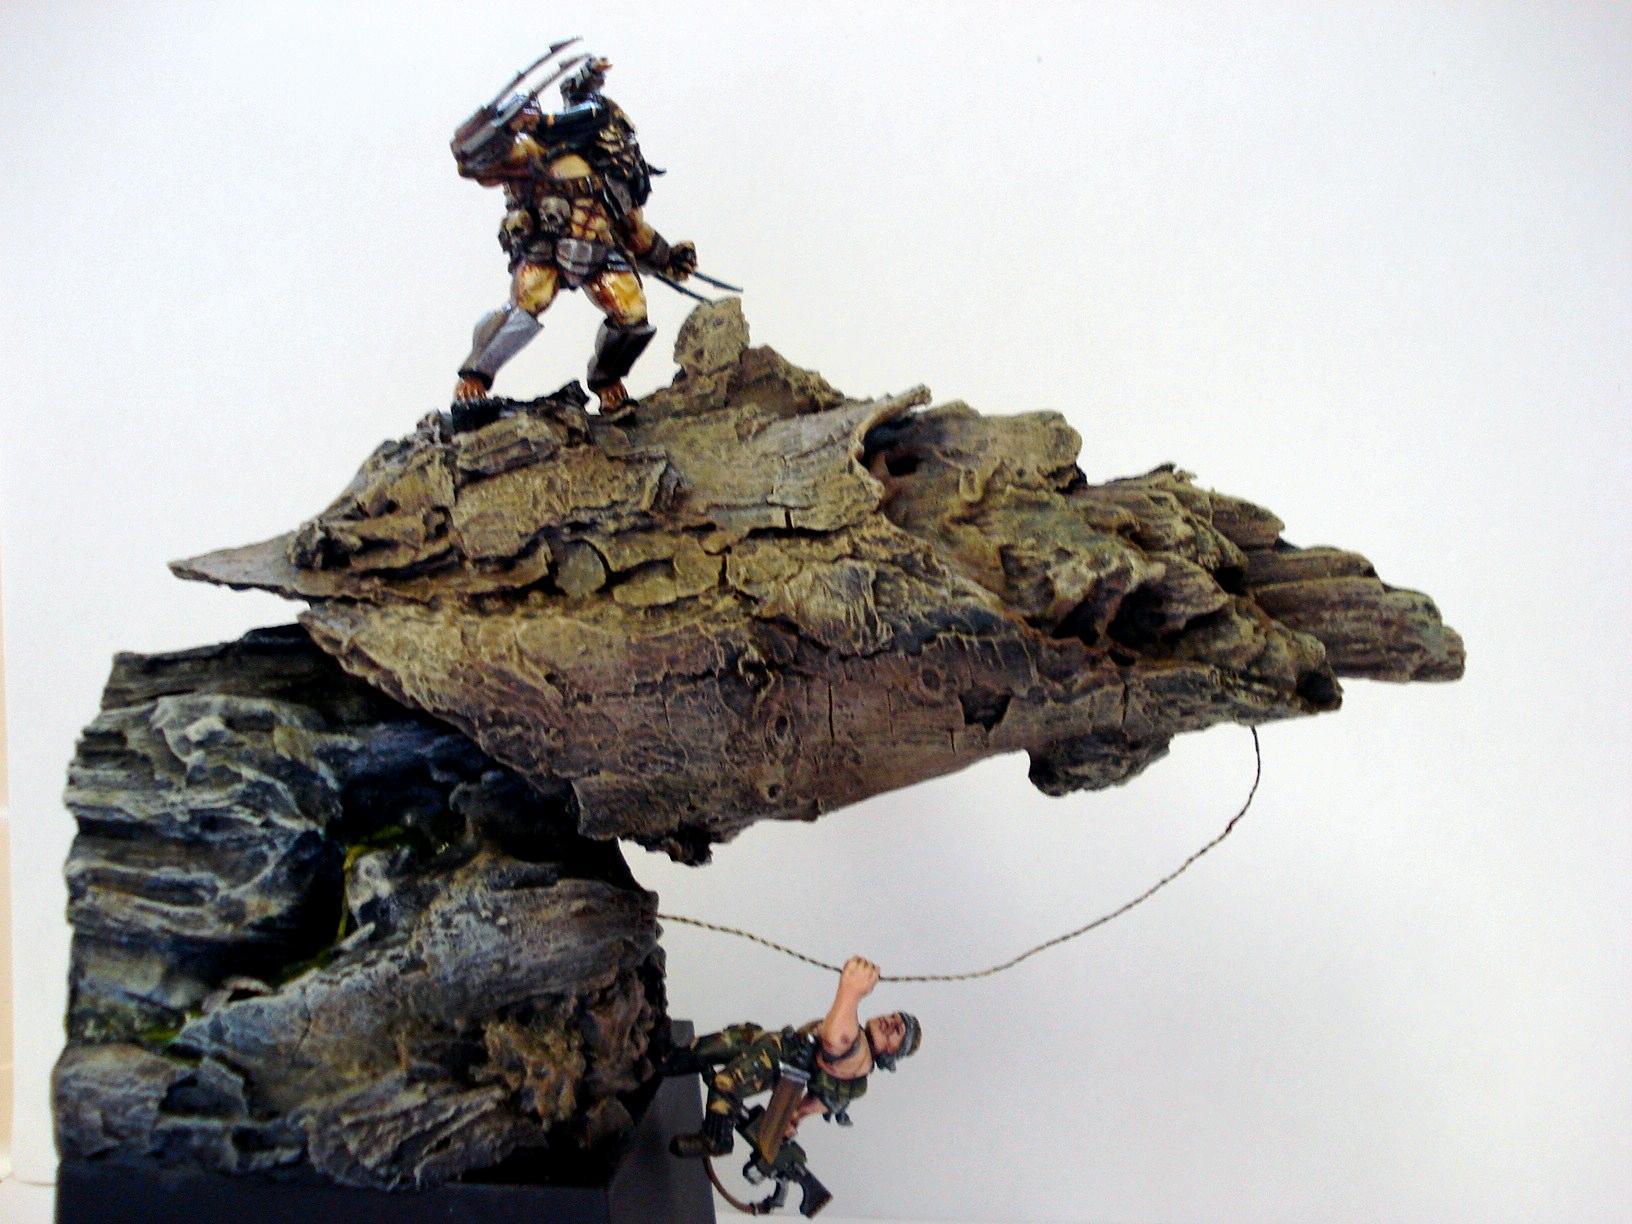 Base, Catachan, Diorama, Duel, Imperial Guard, Predator